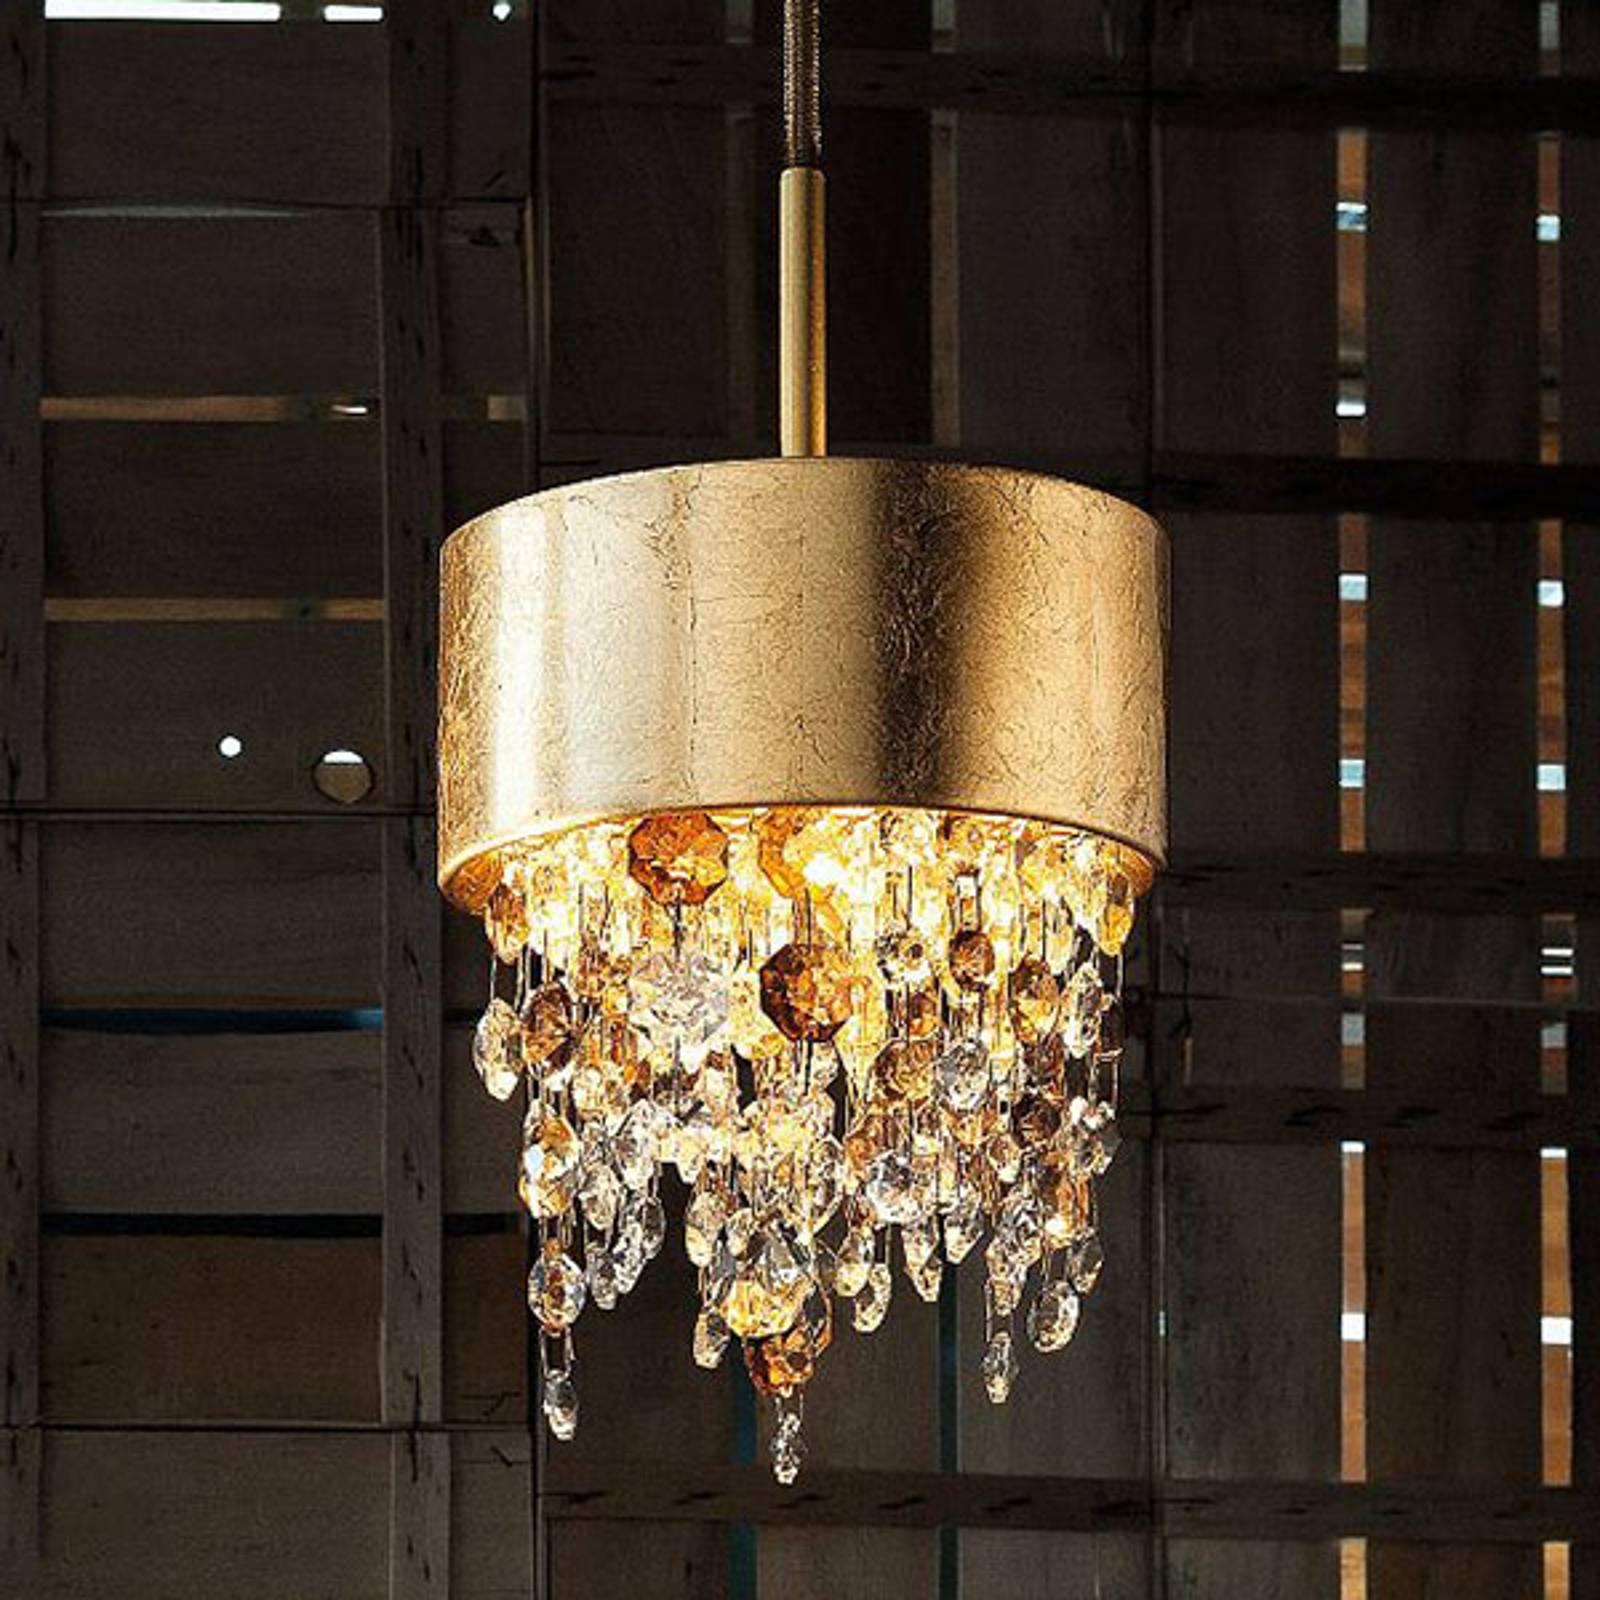 LED-Hängeleuchte Olà S2 15, Ø15cm, blattgold/amber